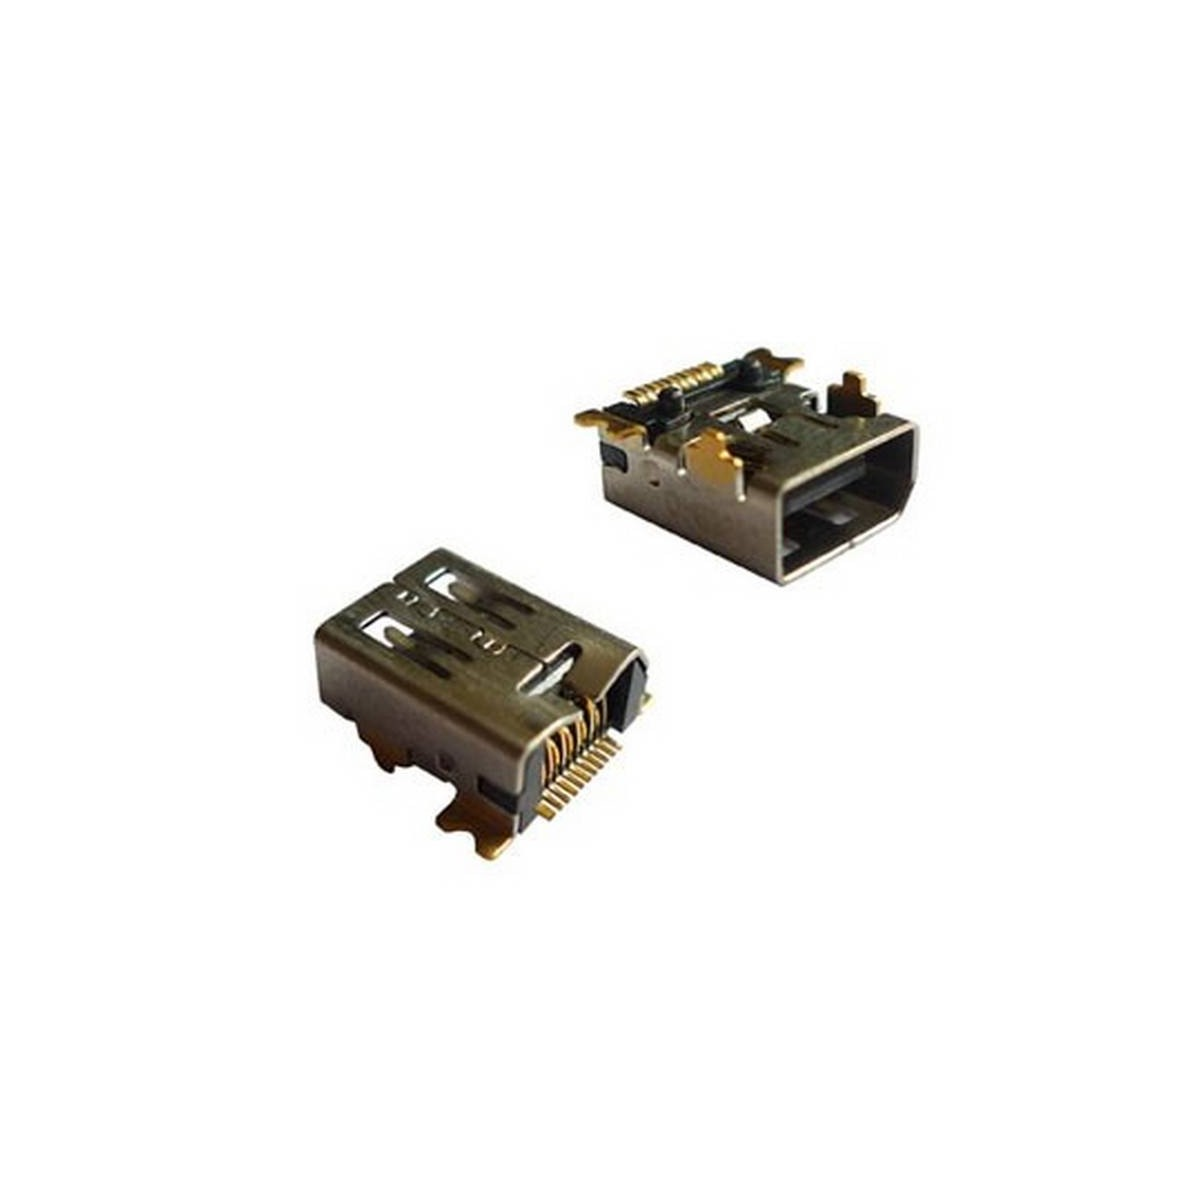 Conector de Carrega para Htc P4550 Tytn II Kaiser Dopod D600 D9000